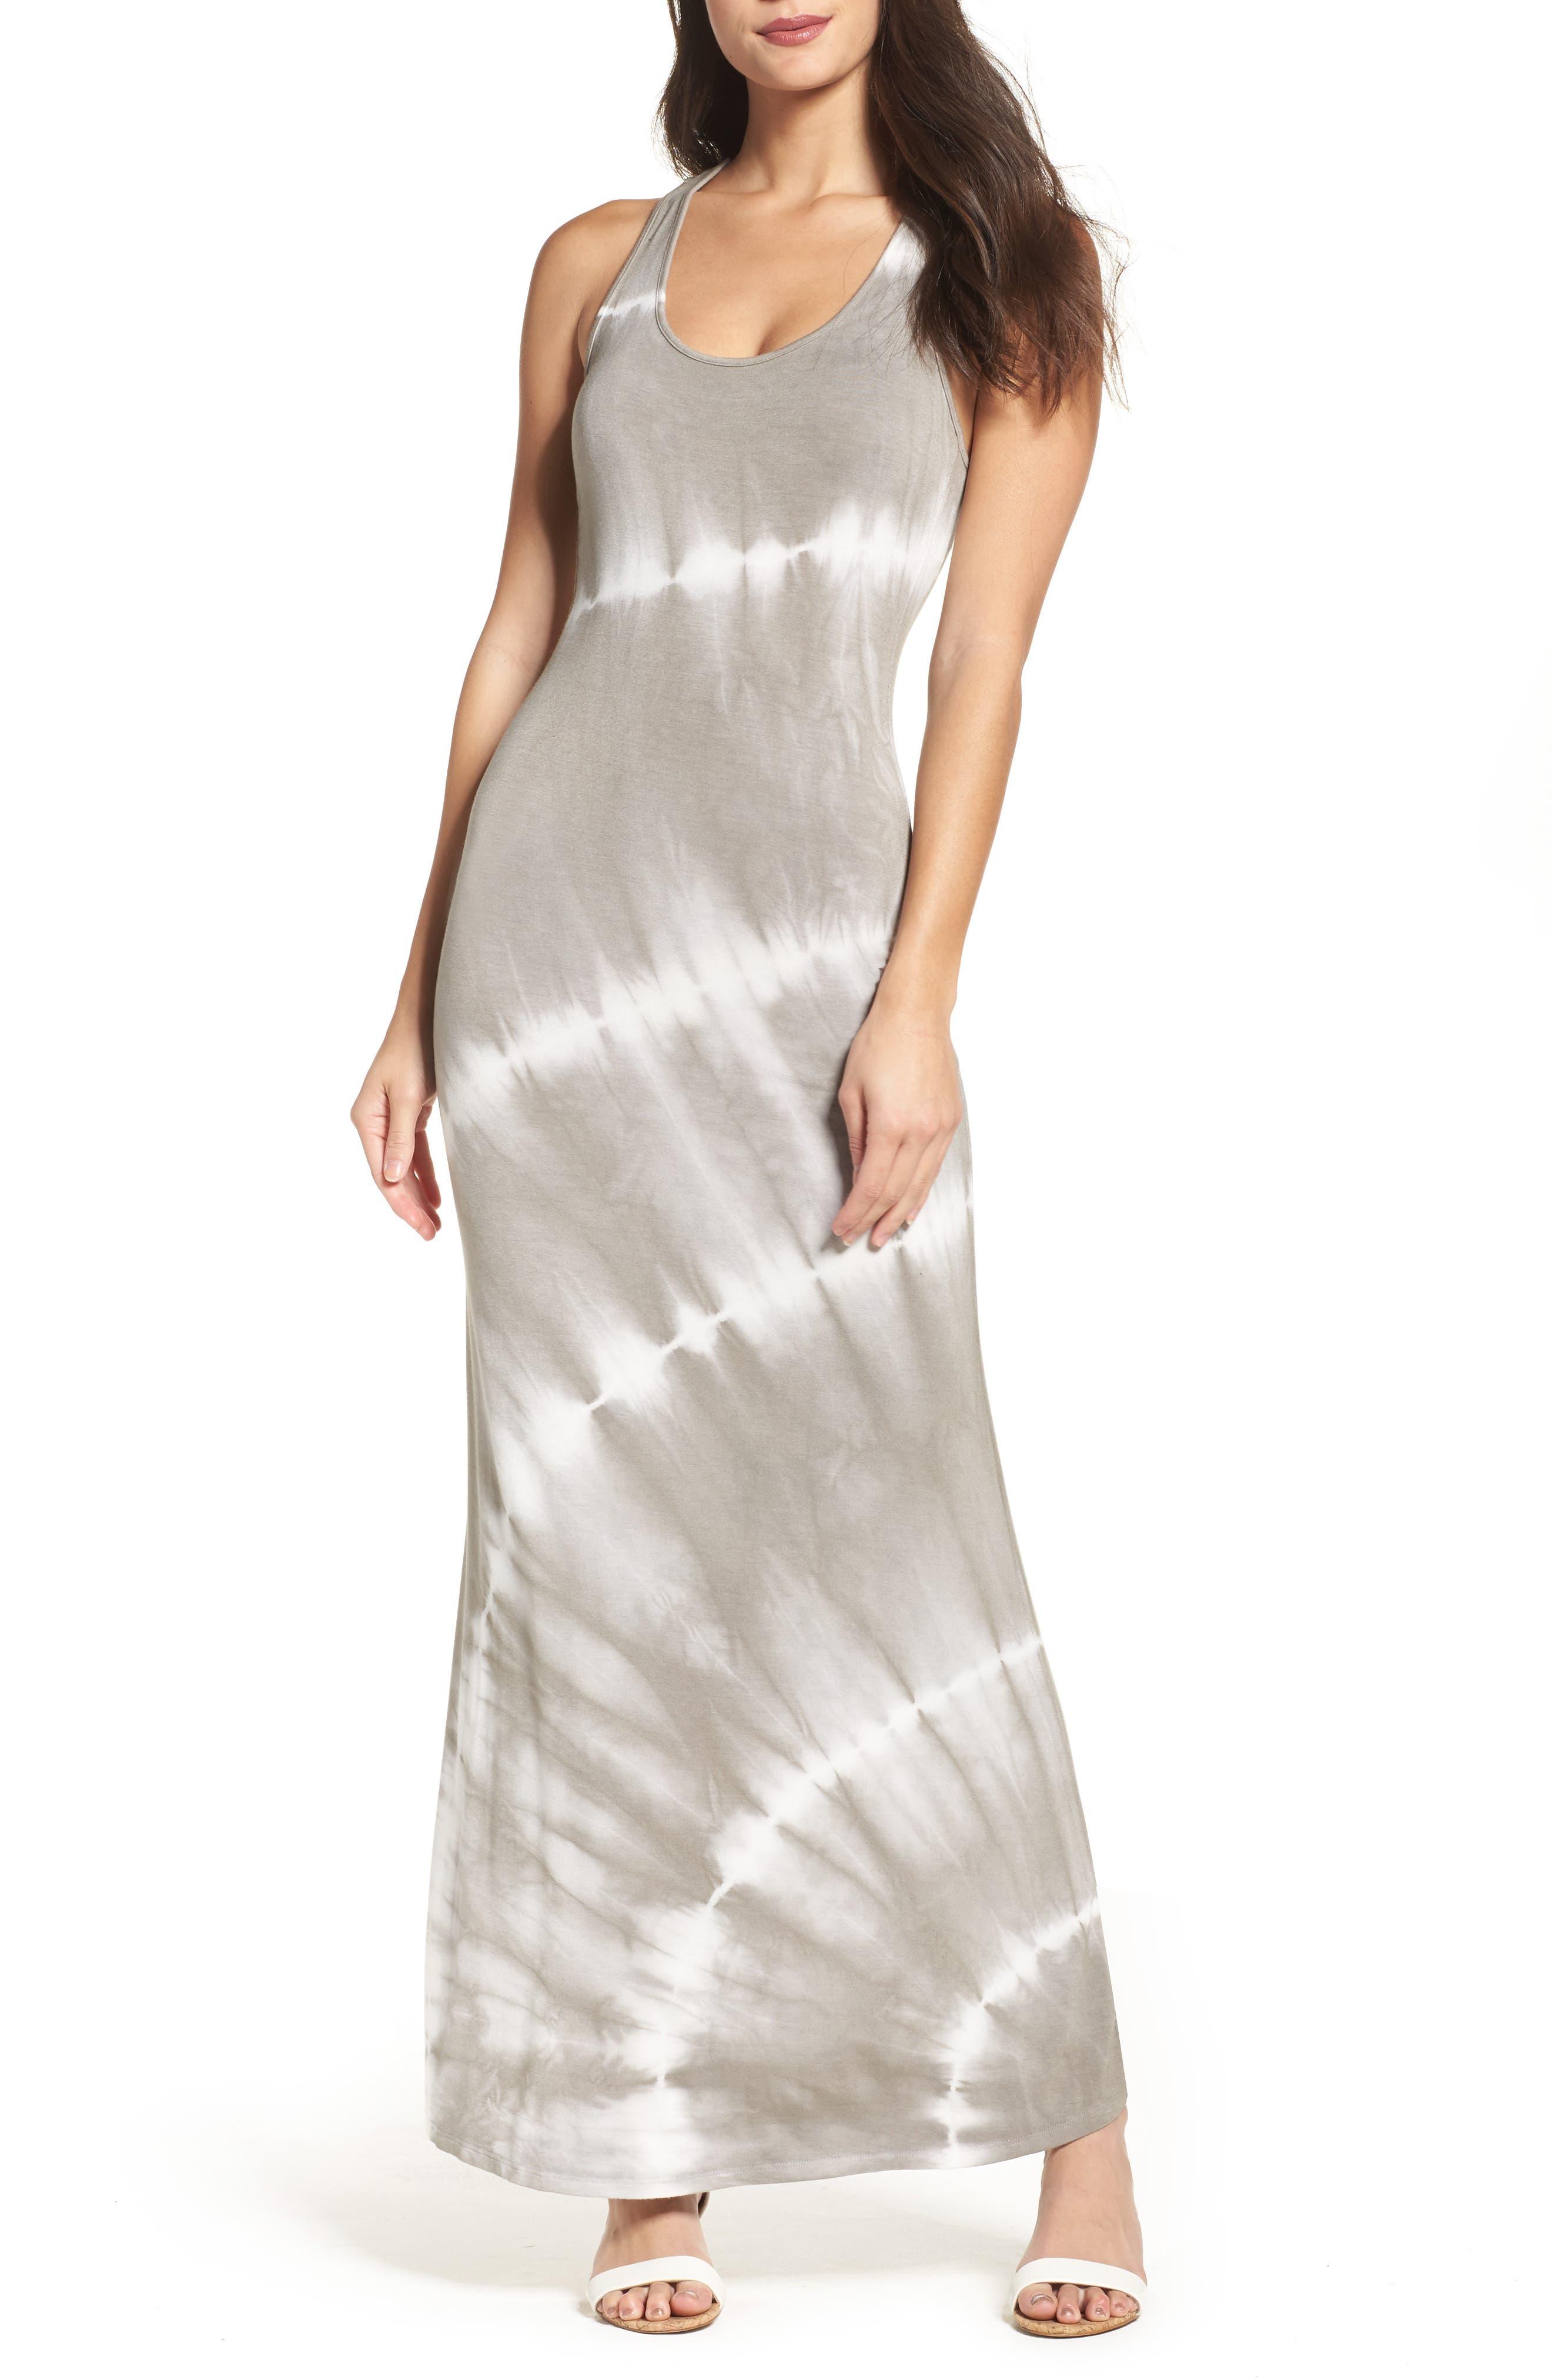 Tie Dye Racerback Maxi Dress,                             Main thumbnail 1, color,                             Grey/ White